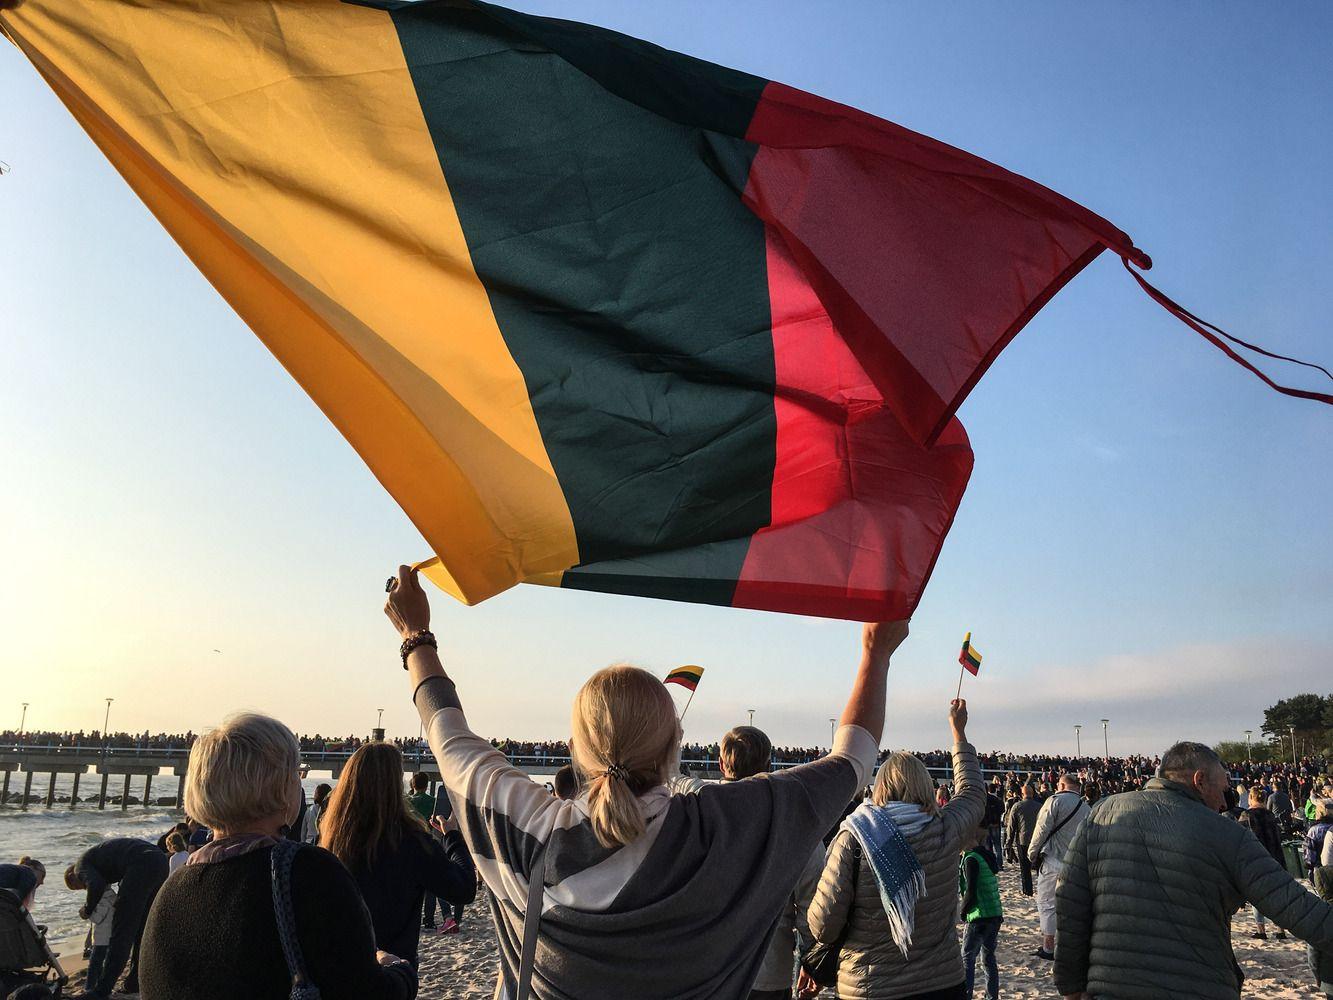 Lietuva – skaidrumo etalonas pinigų plovimo prevencijos srityje